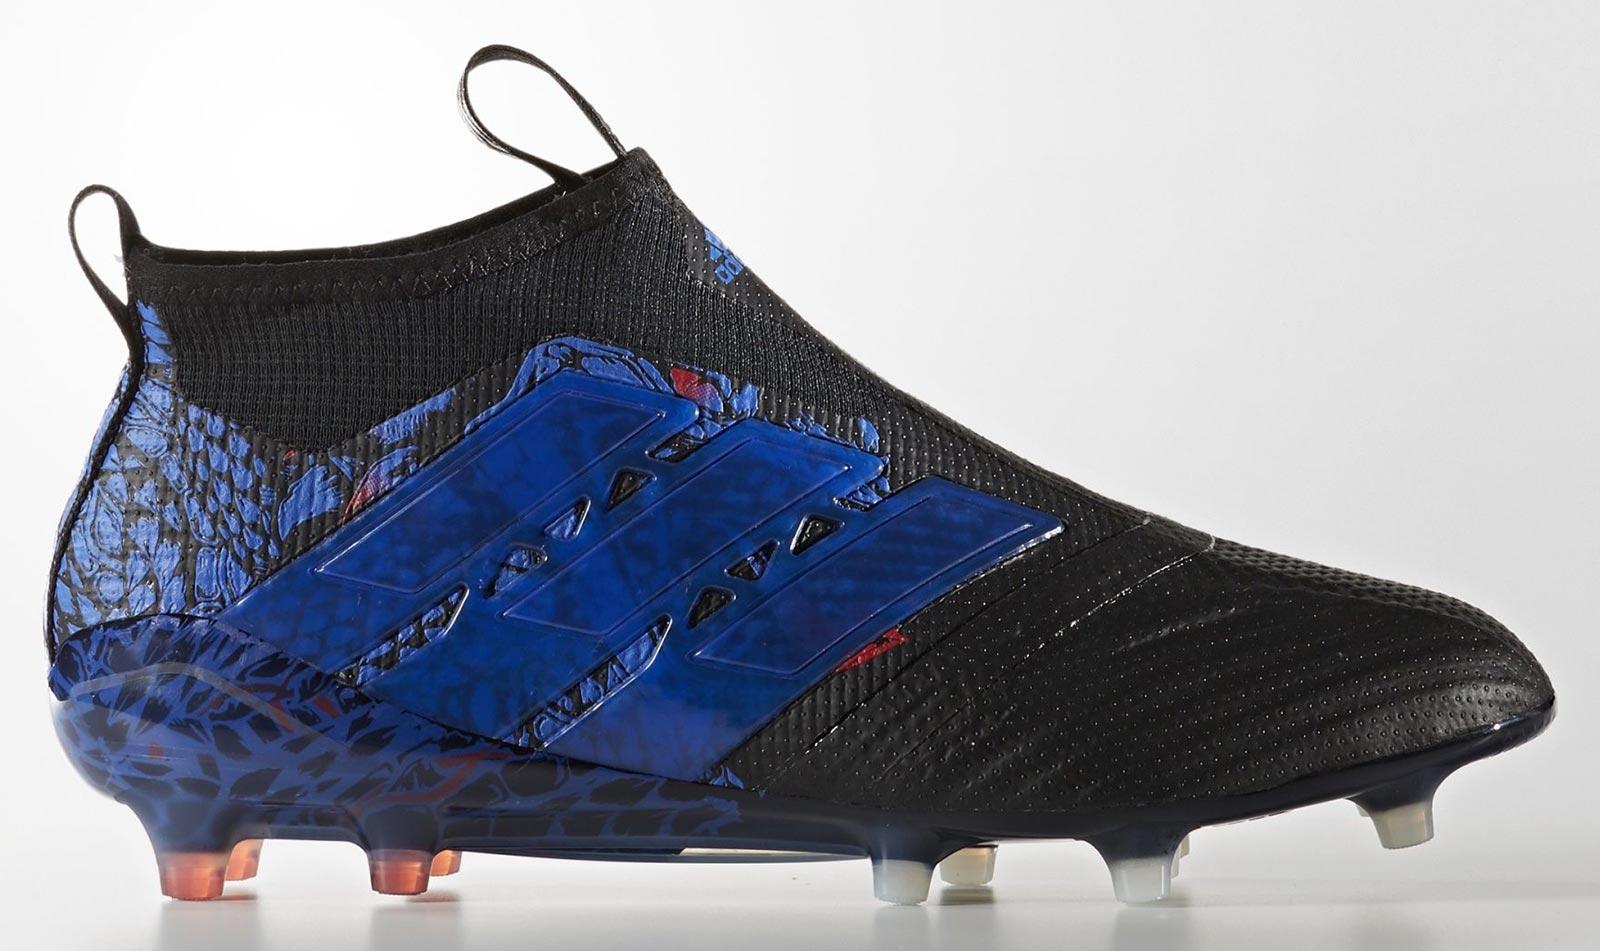 Adidas X 17 Purecontrol